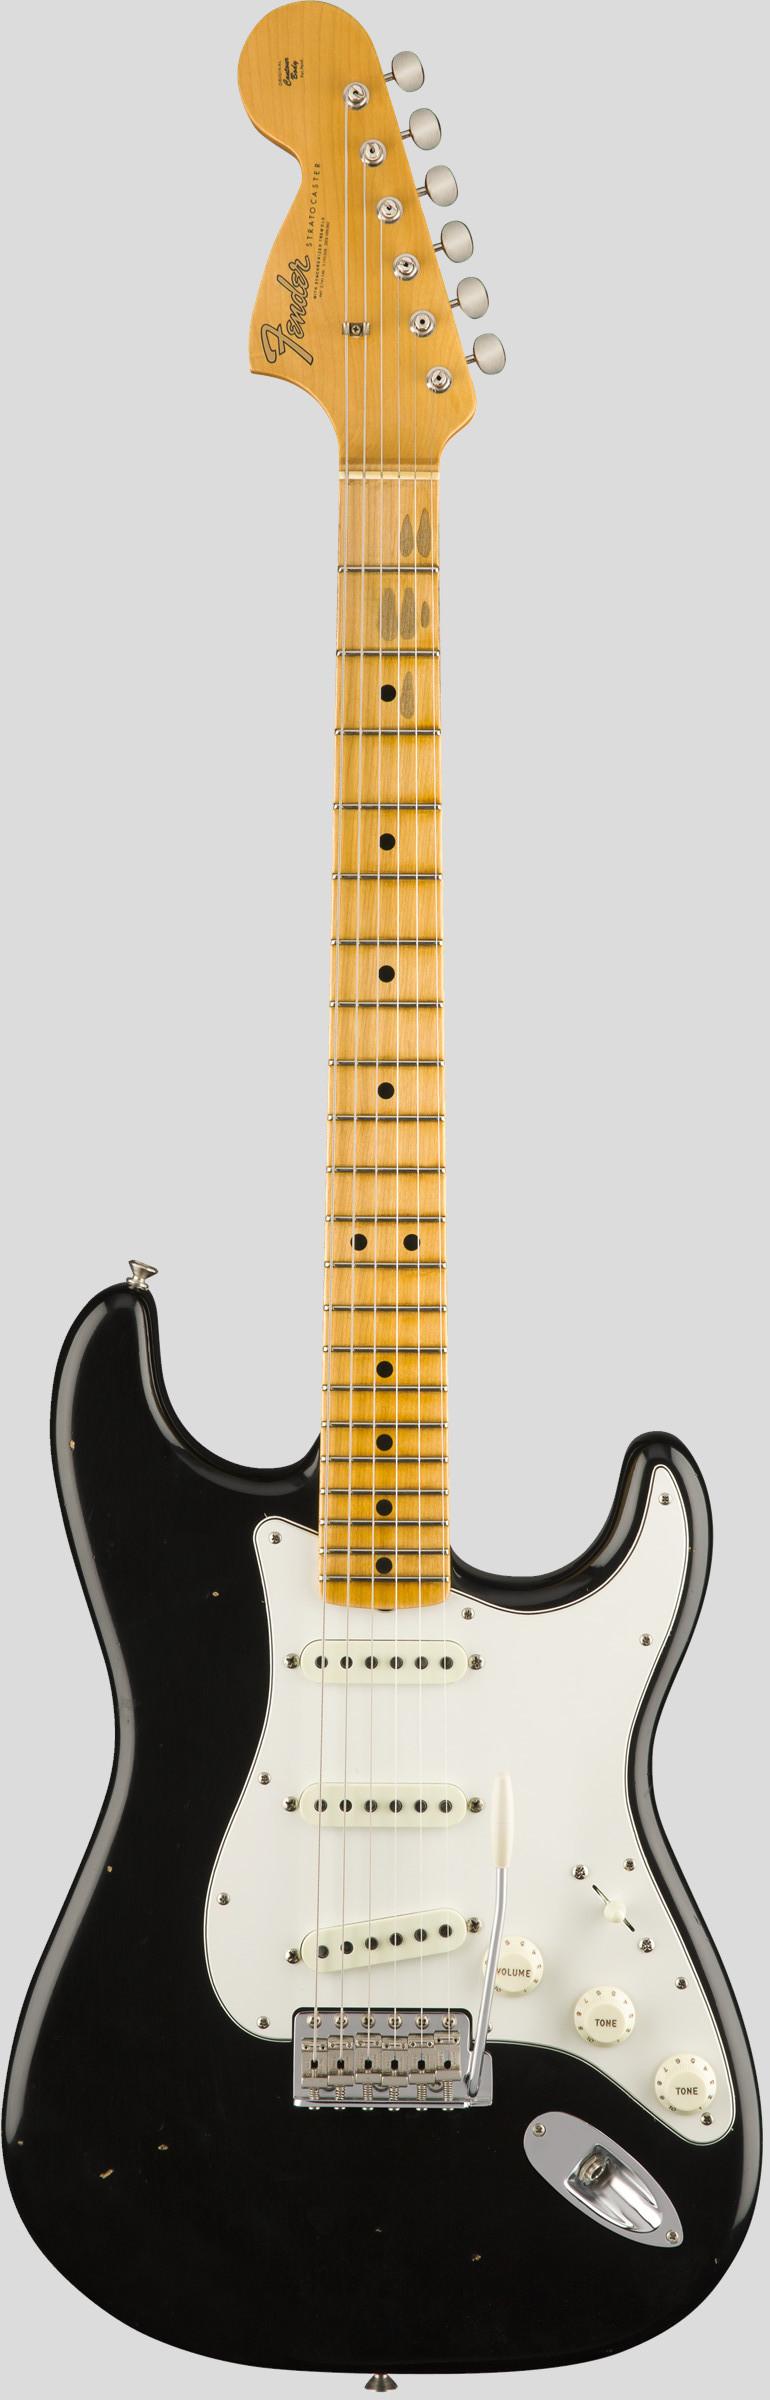 Fender Custom Shop Jimi Hendrix Voodoo Child Stratocaster Black Journeyman Relic 1